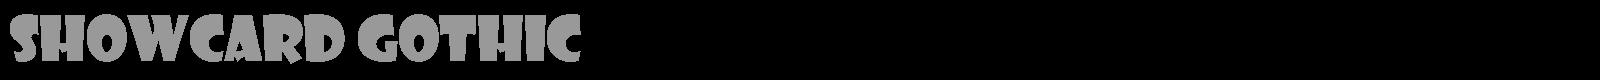 showcard gothic reg font